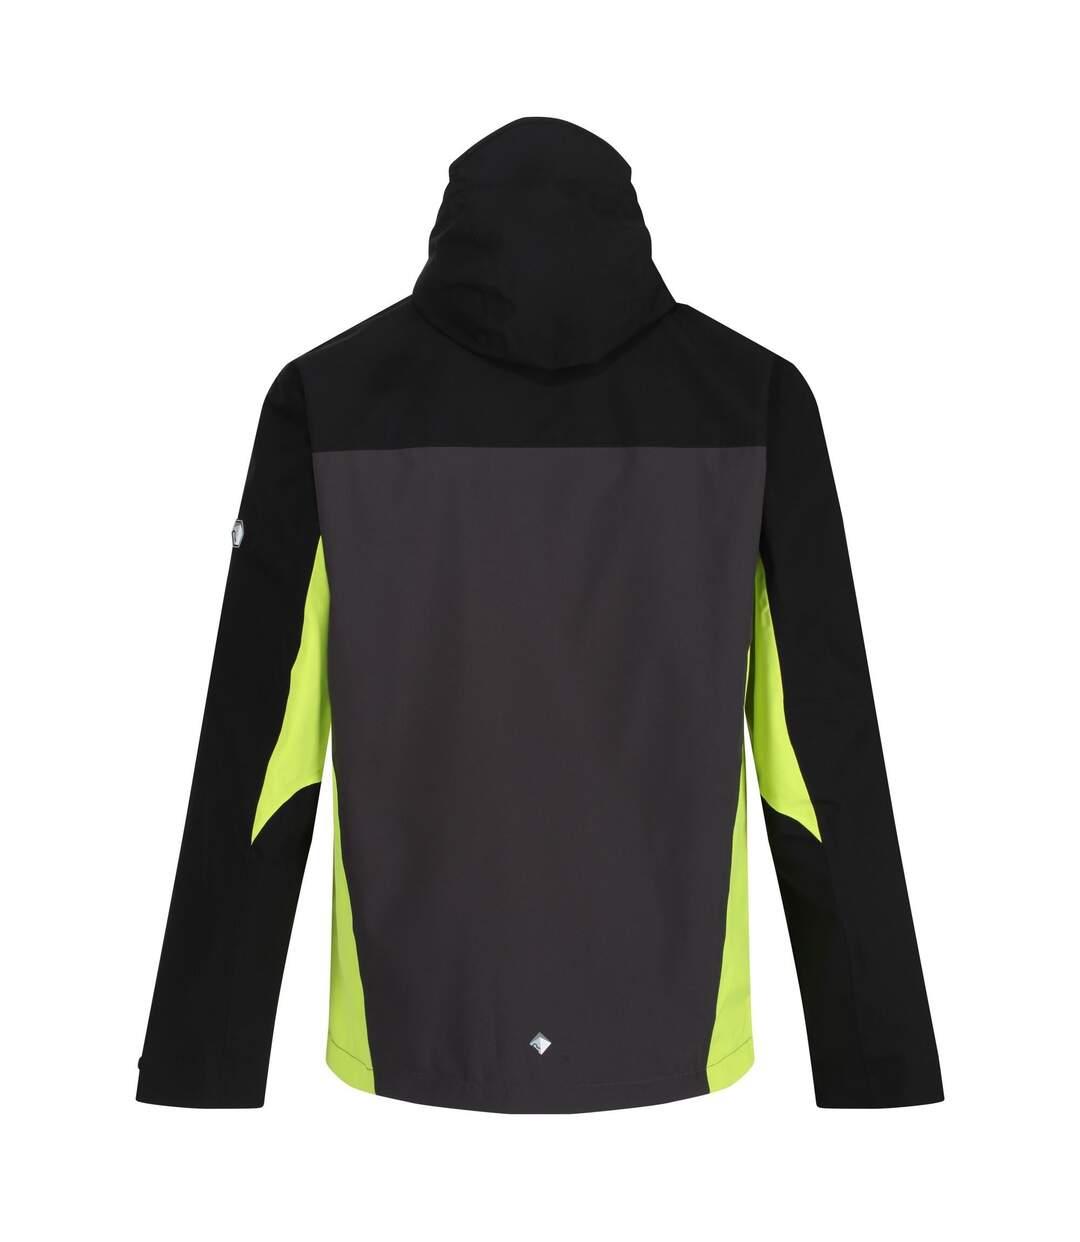 Regatta Mens Birchdale Waterproof Hooded Jacket (Ash/Black) - UTRG3474